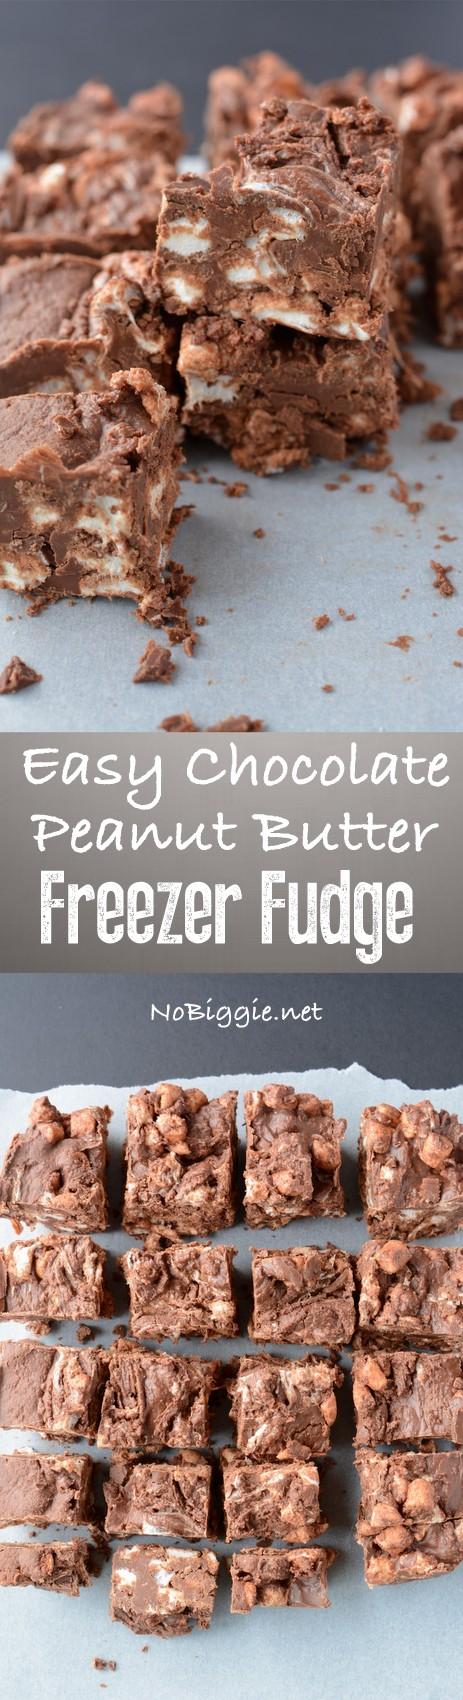 Easy Chocolate Peanut Butter Freezer Fudge | NoBiggie.net